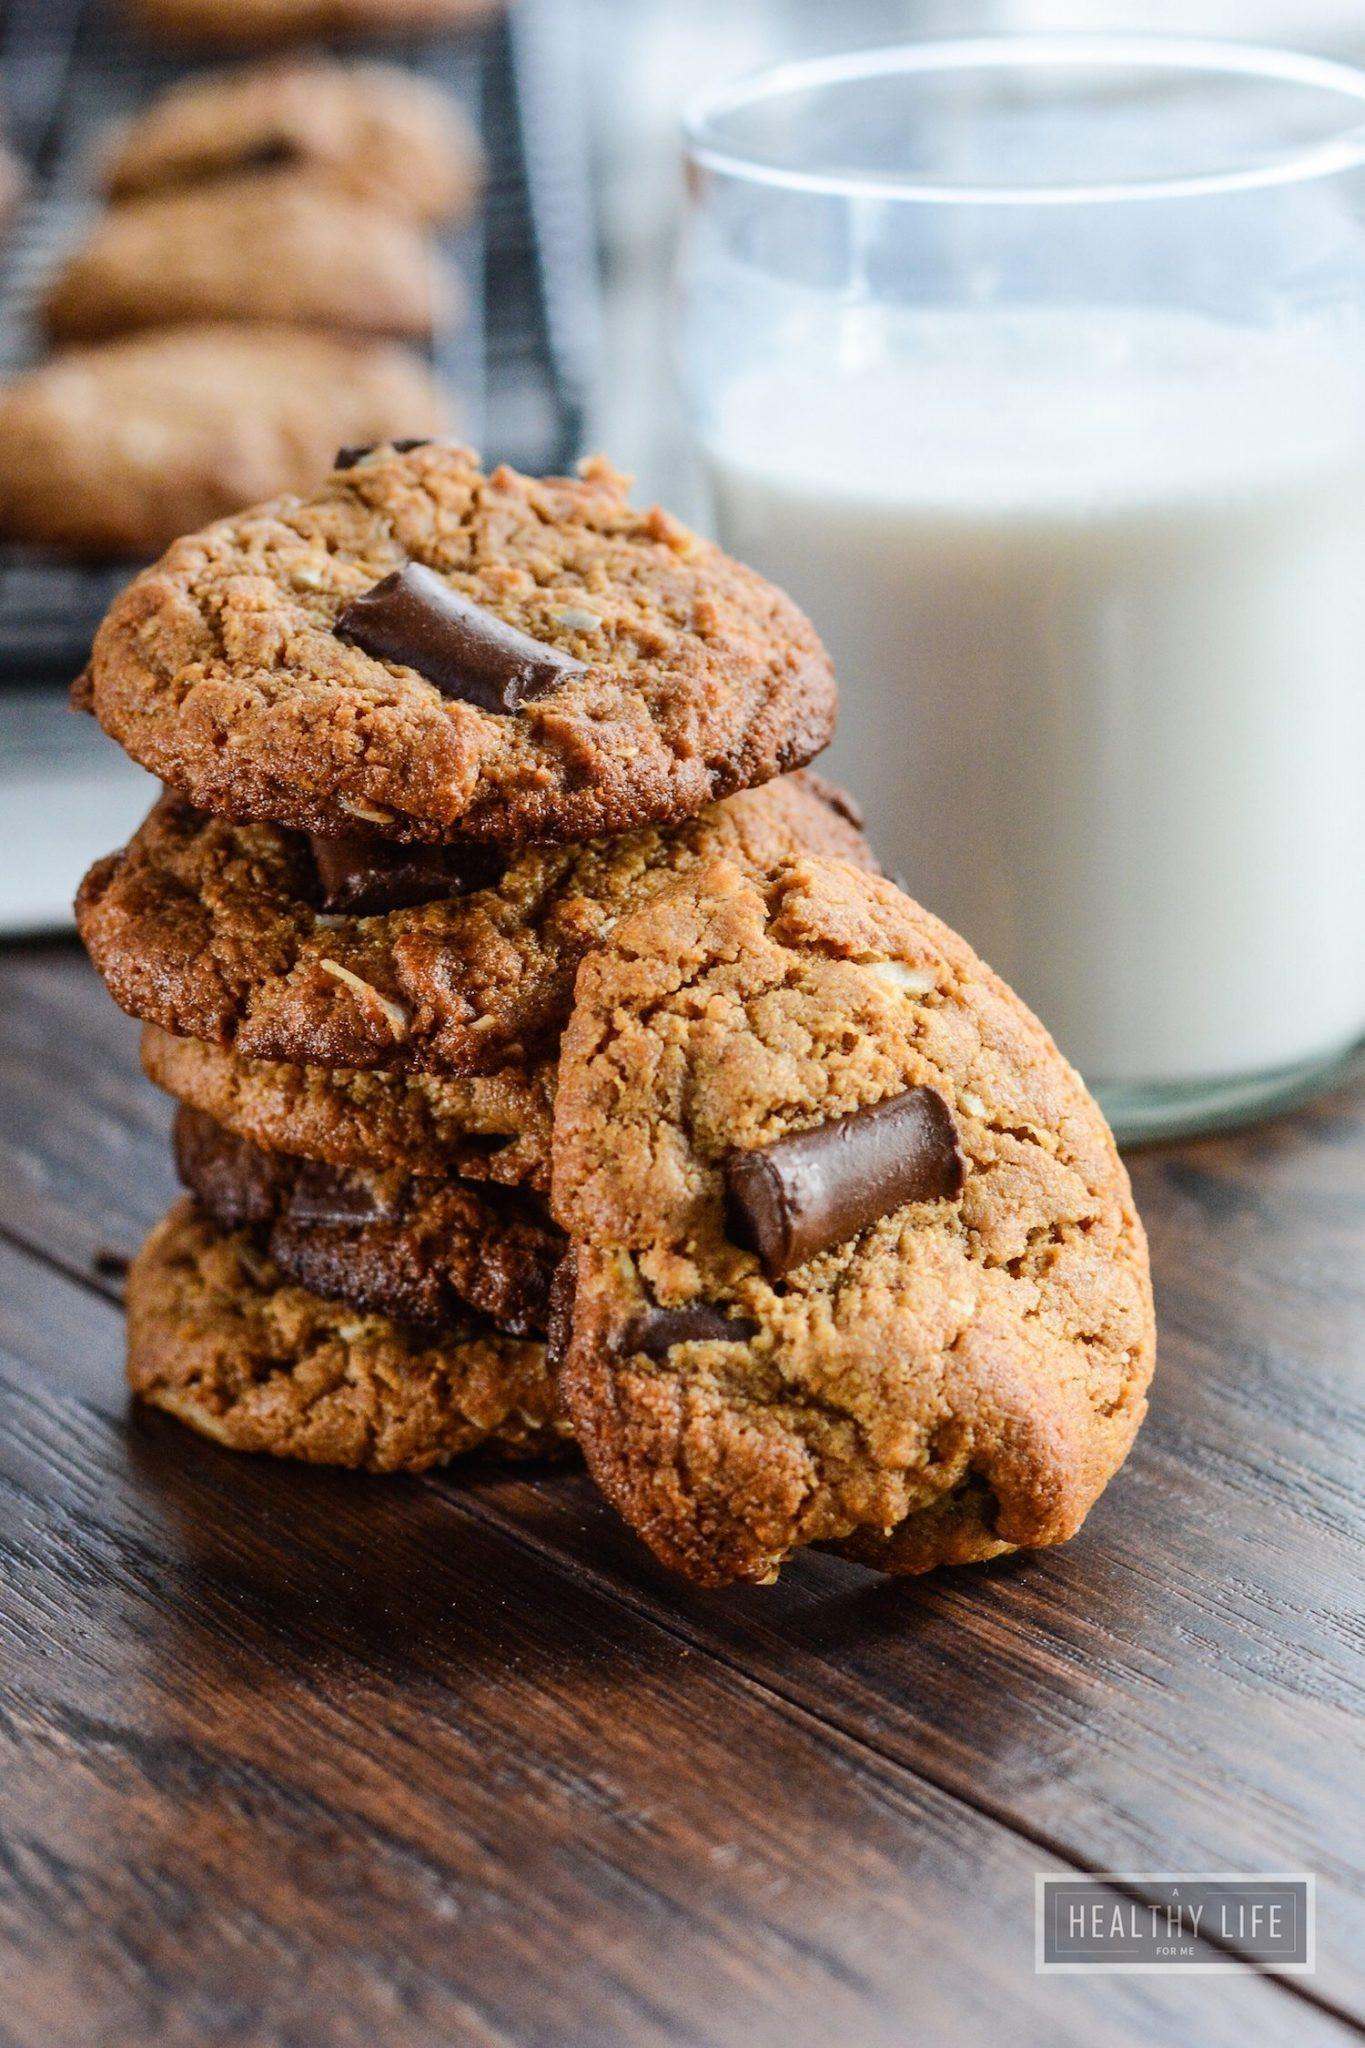 Coconut Chocolate Chip Cookies  Cashew Coconut Chocolate Chip Cookies paleo gluten free